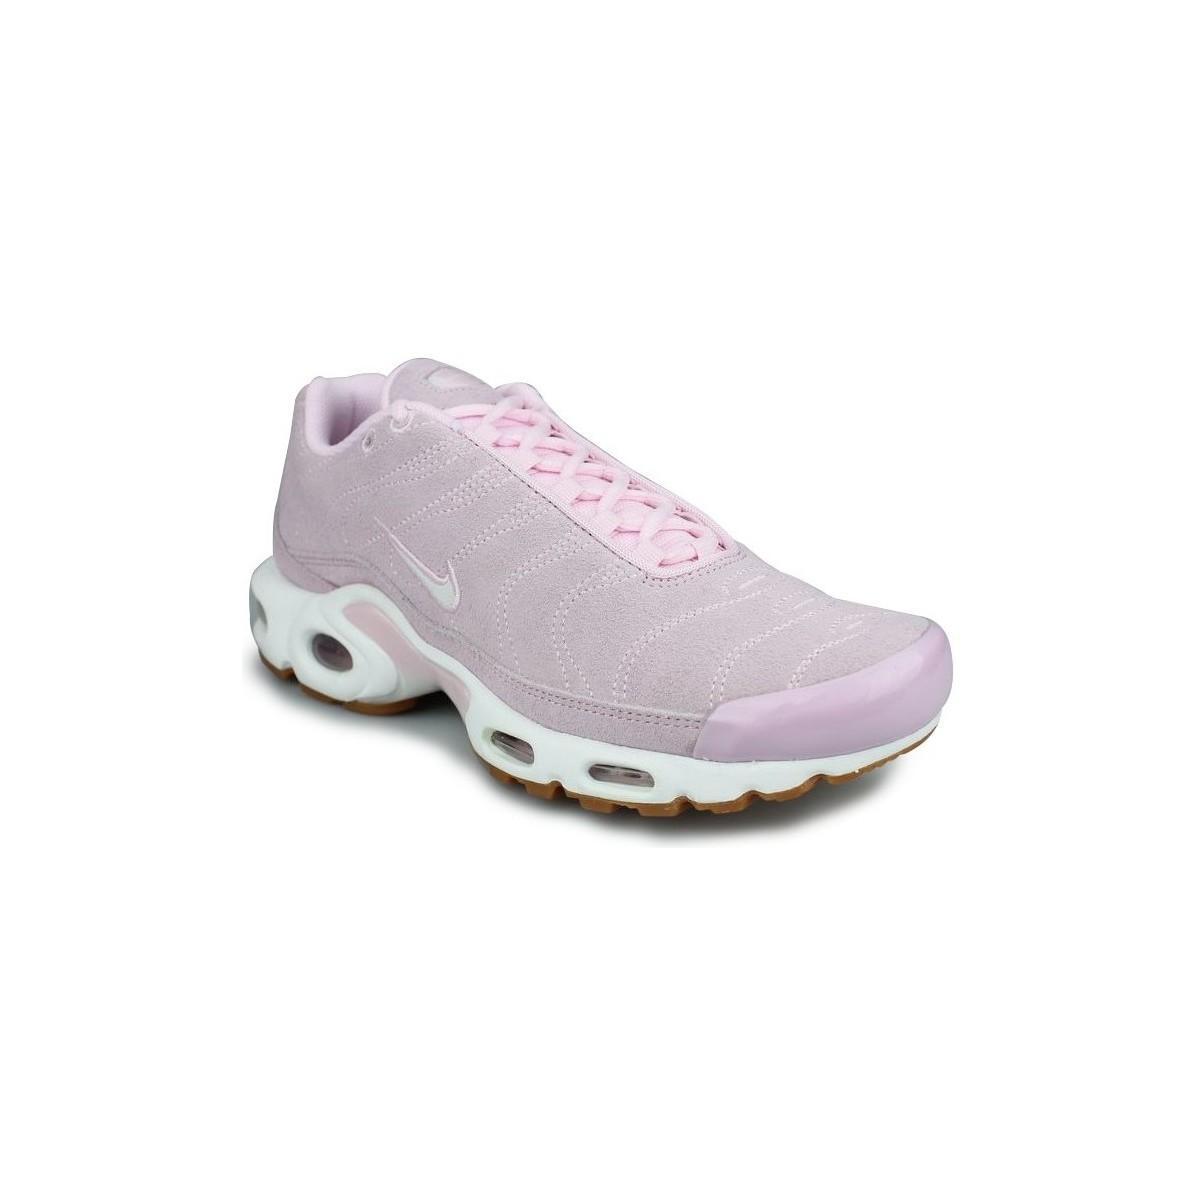 WMNS Air Max Plus Premium Tn Rose Chaussures Nike en coloris Rose ...